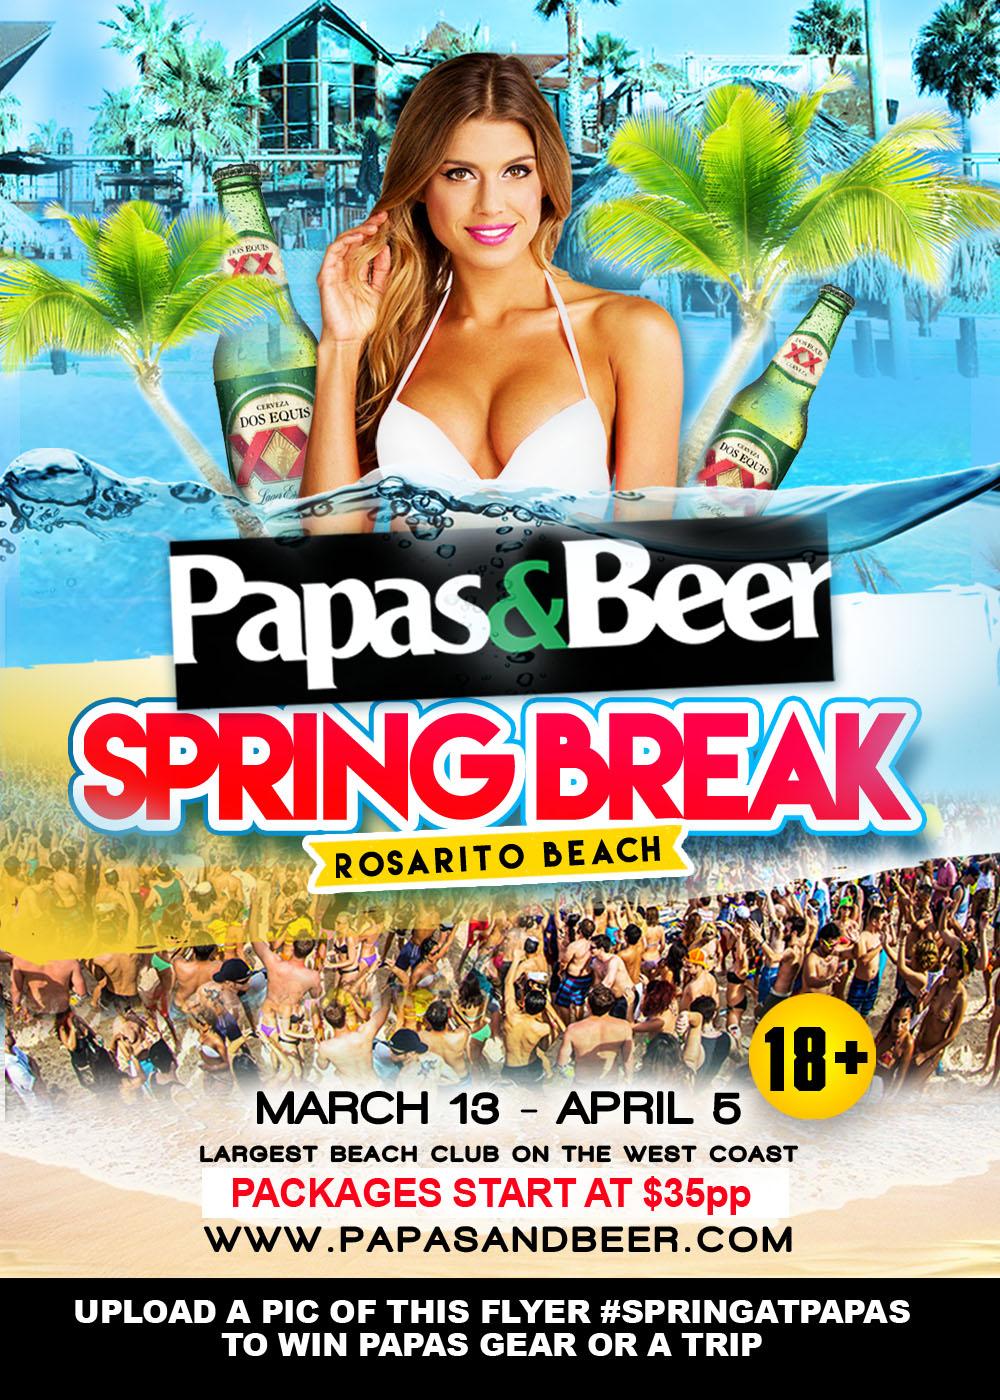 flyer spring break 2015 frente copia.jpg